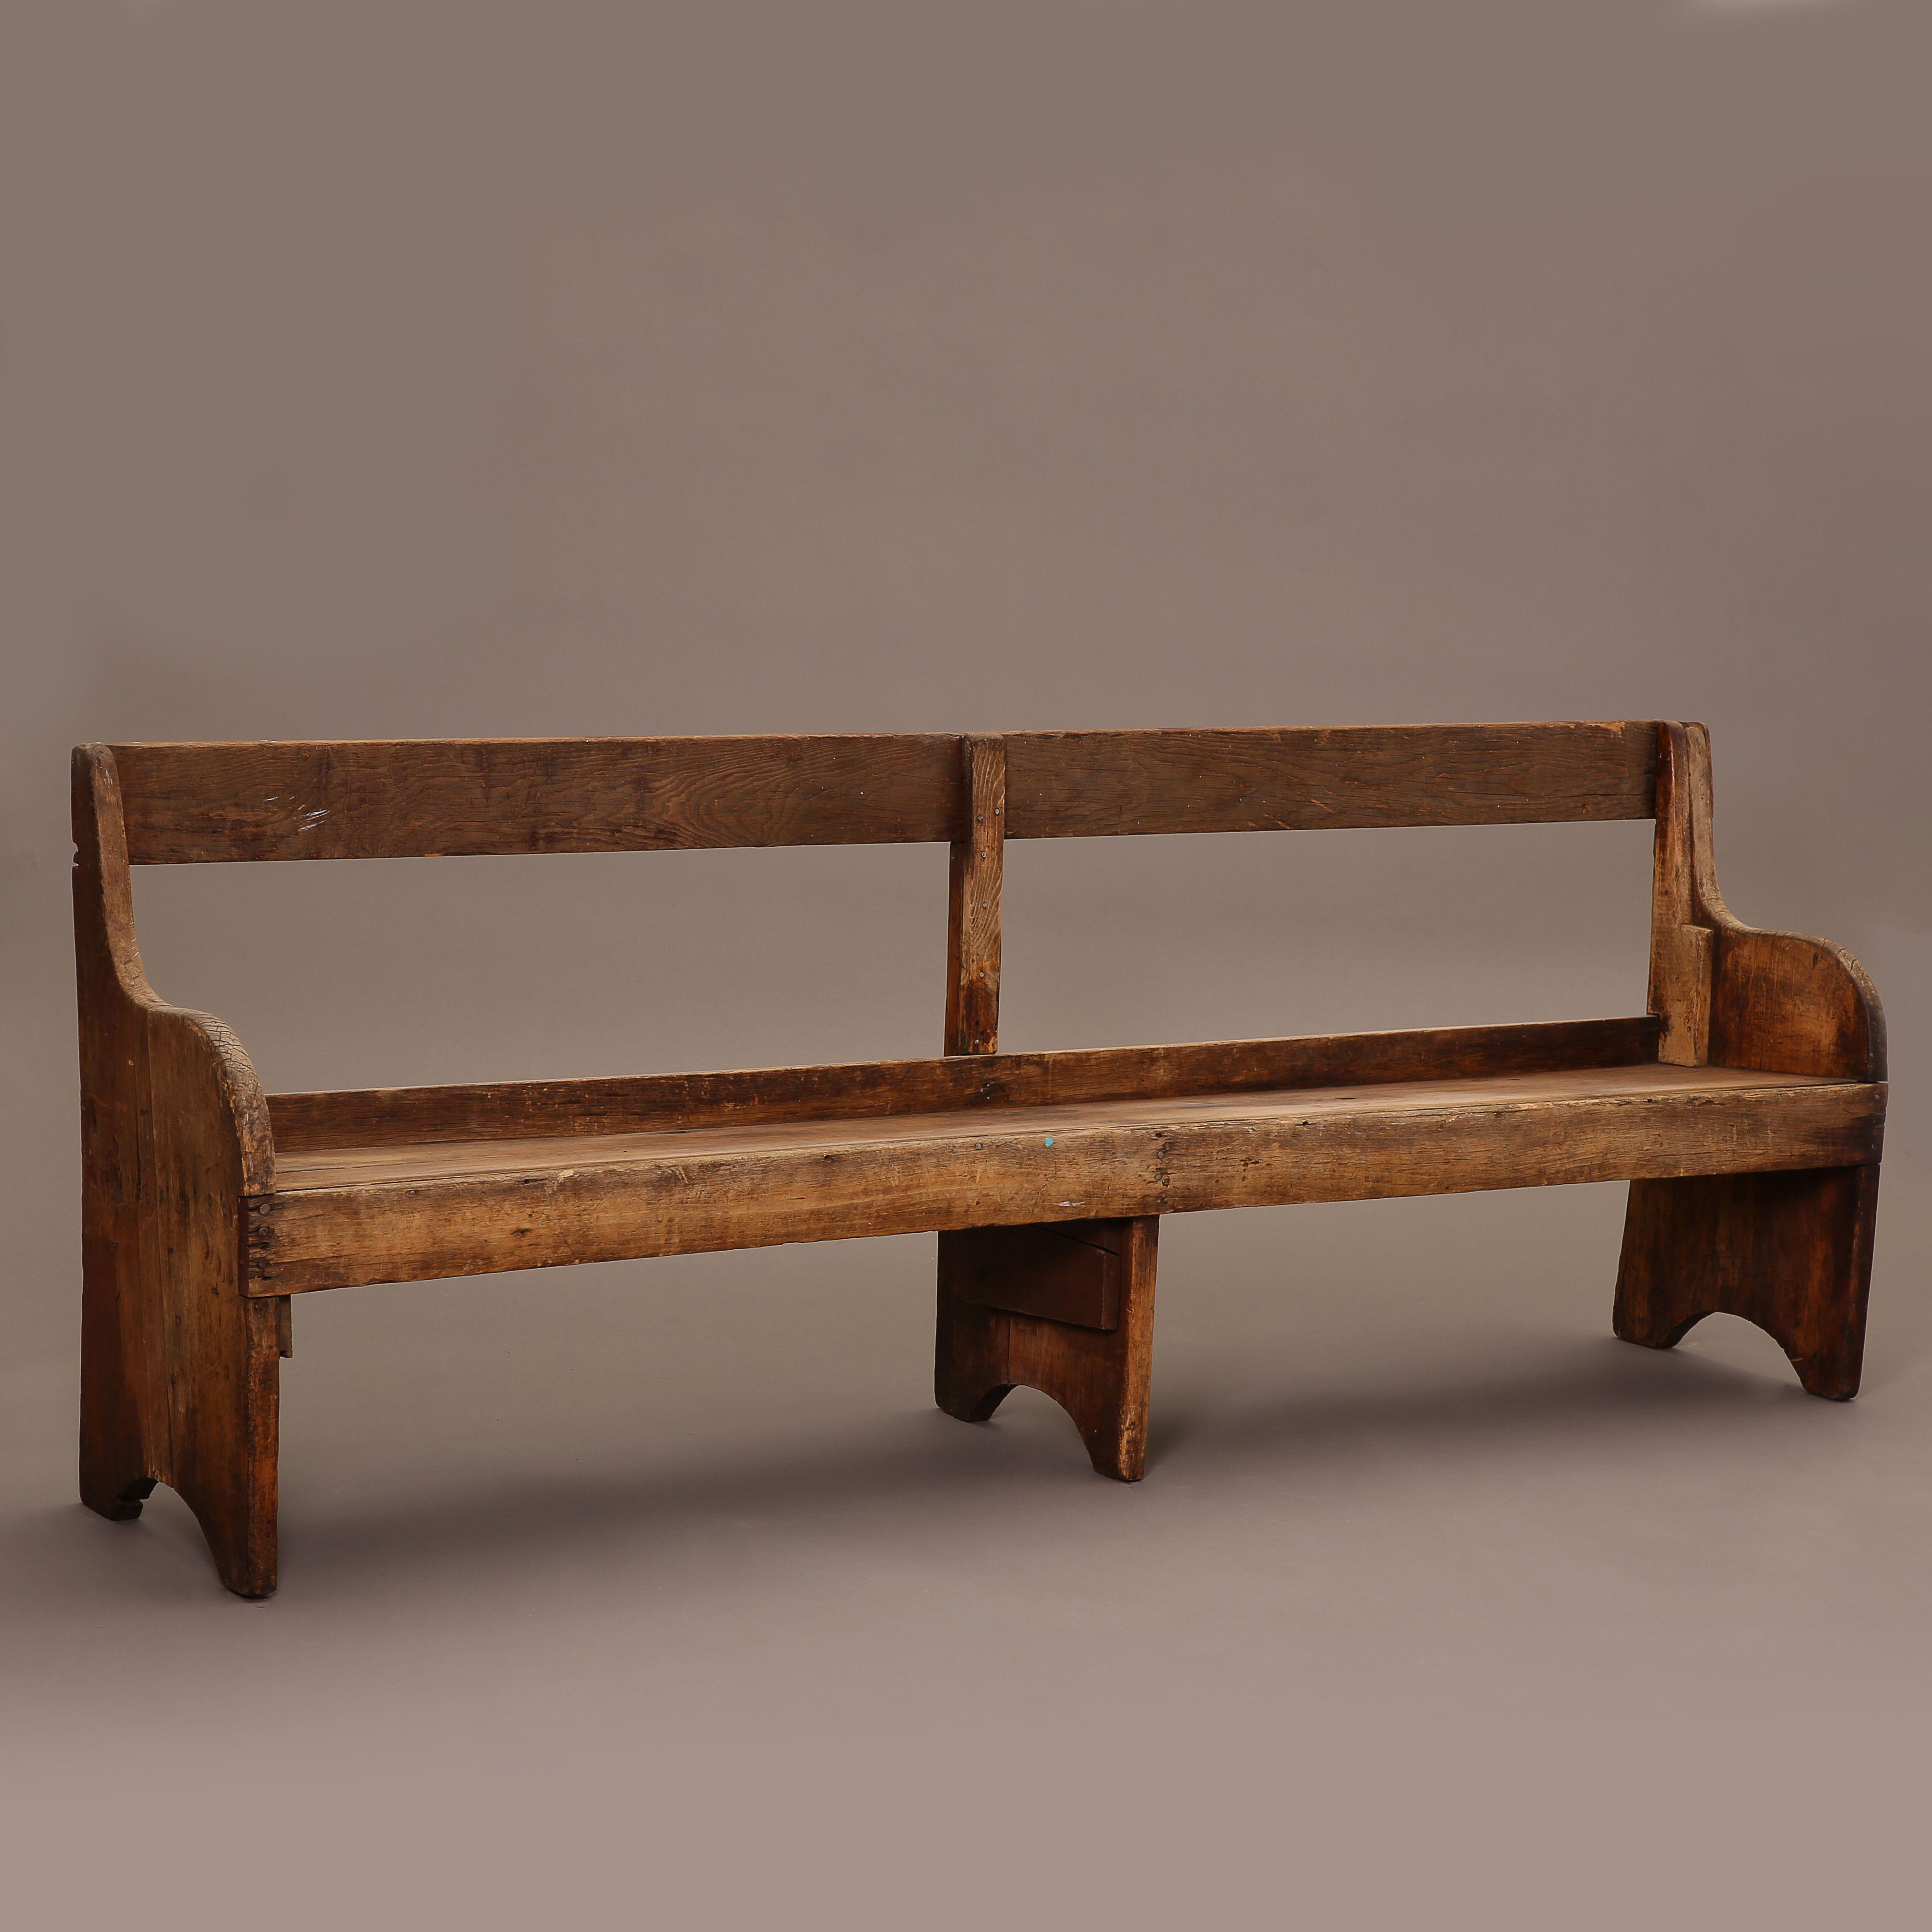 New Mexico, Wooden Banco Bench, ca. 1900